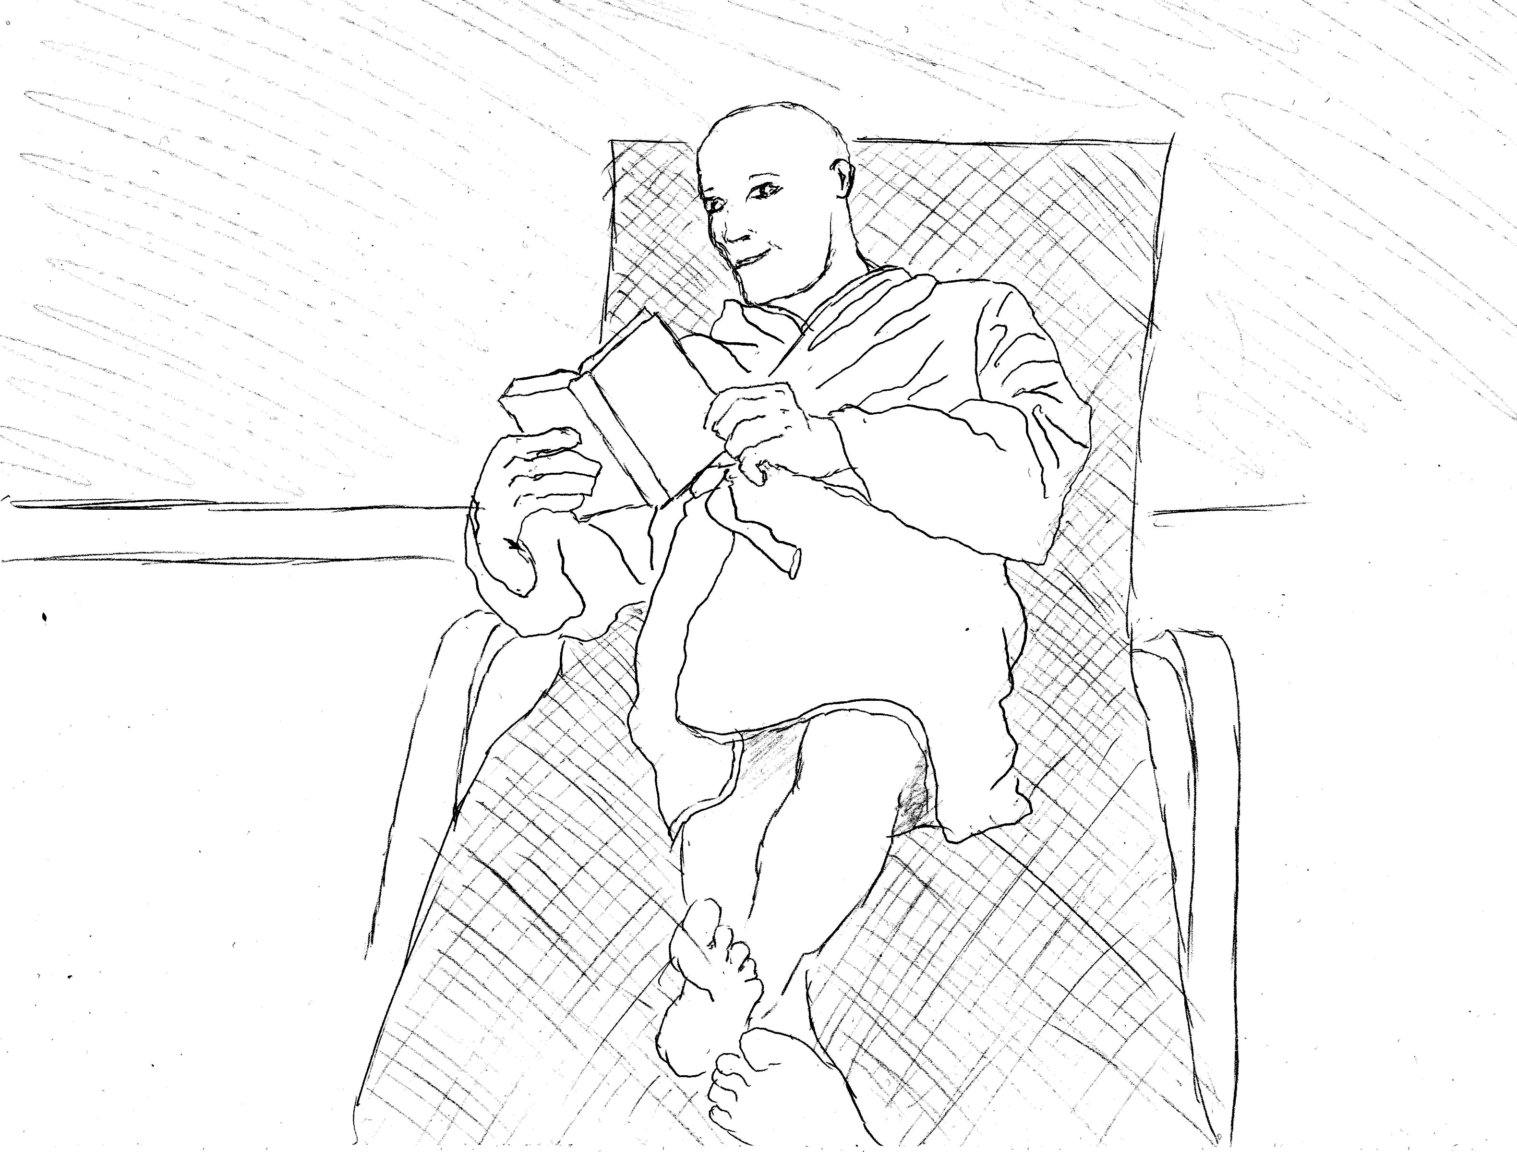 Vervum_storyboard_17